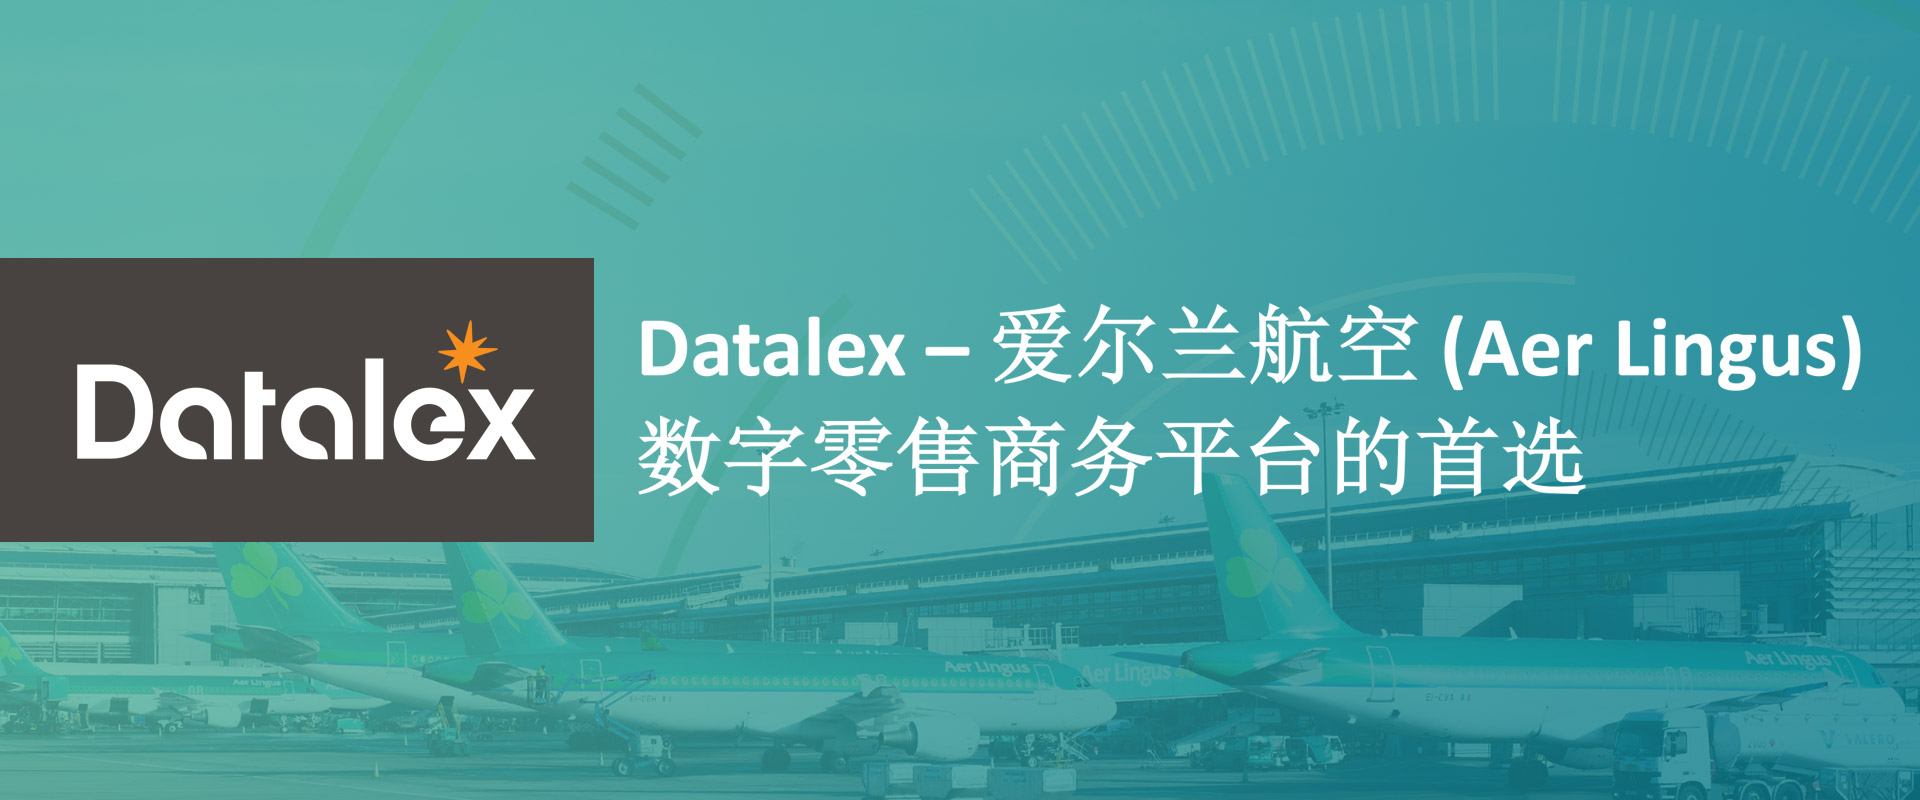 Datalex – 爱尔兰航空 (Aer Lingus) 数字零售商务平台的首选